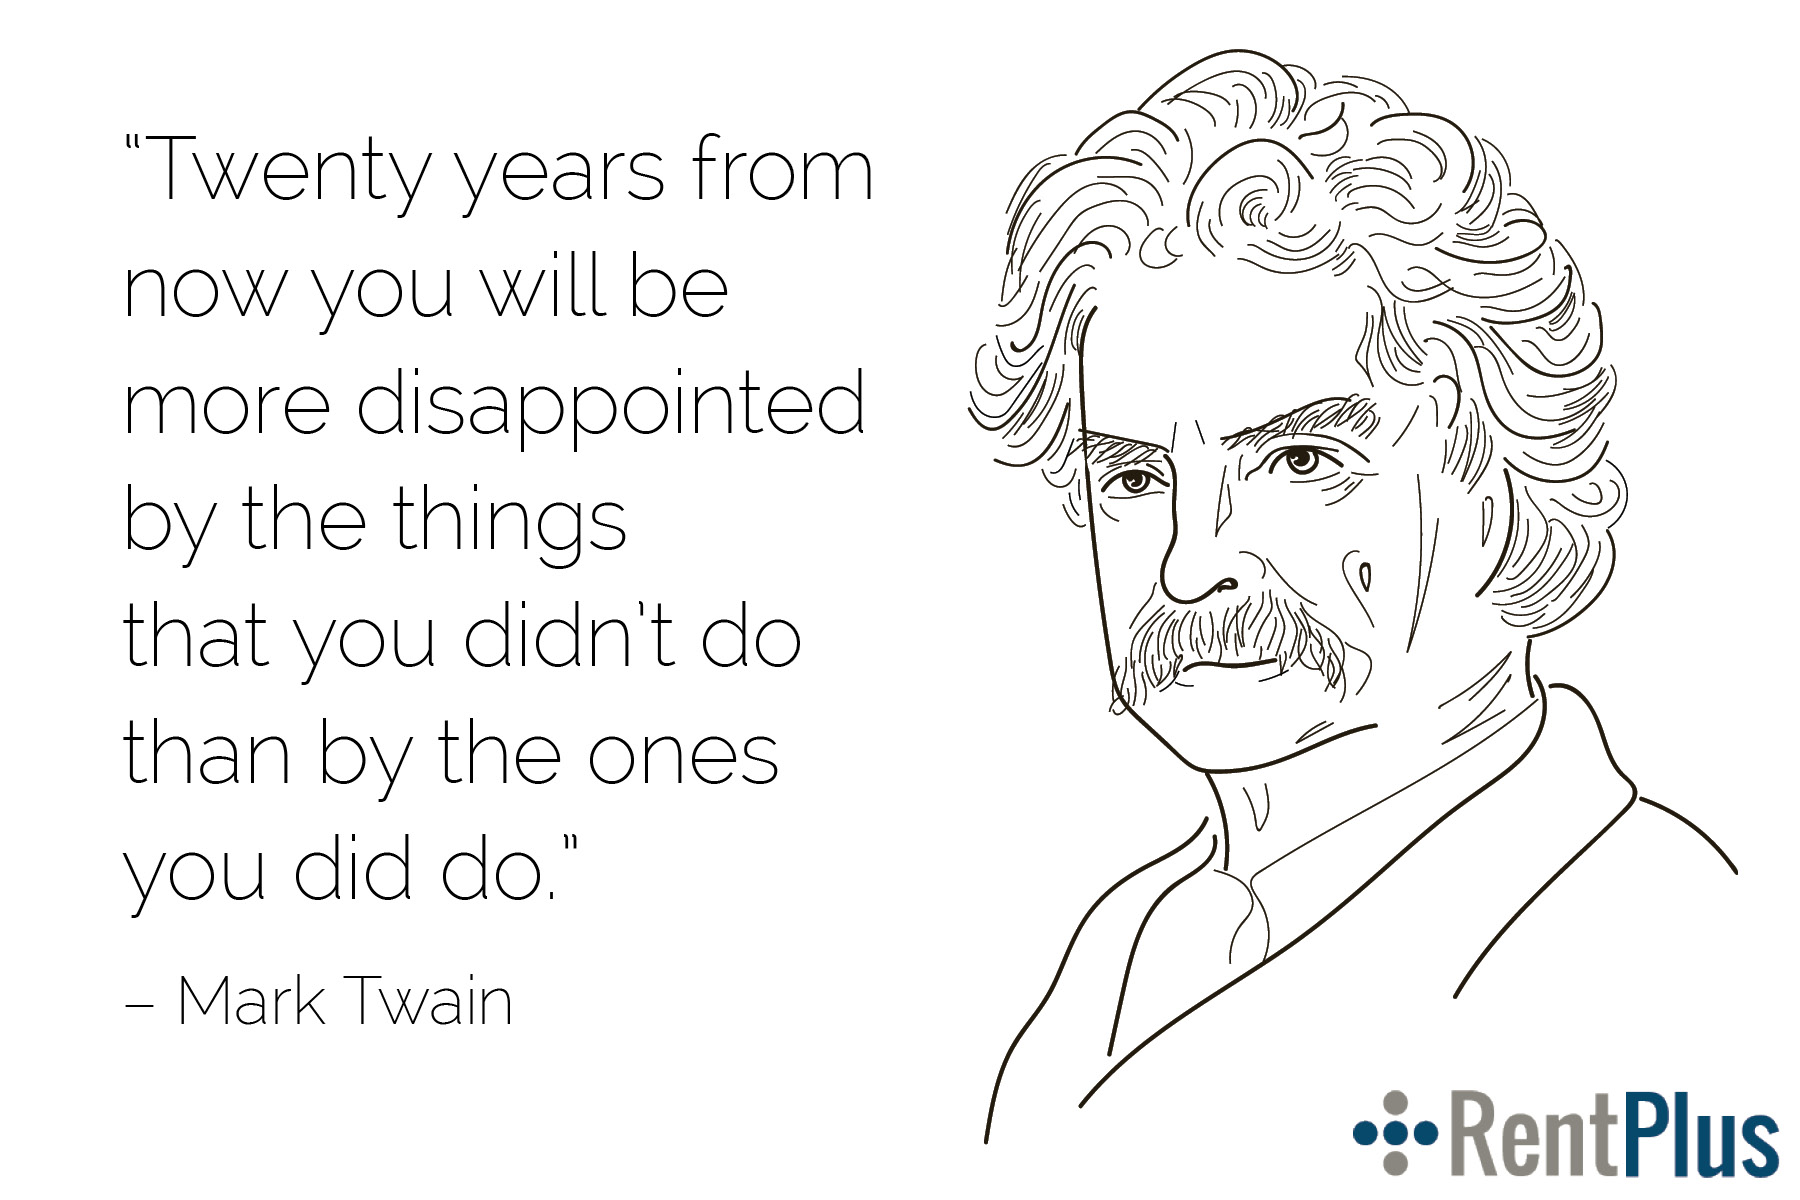 RentPlus – Mark Twain Quote.jpg